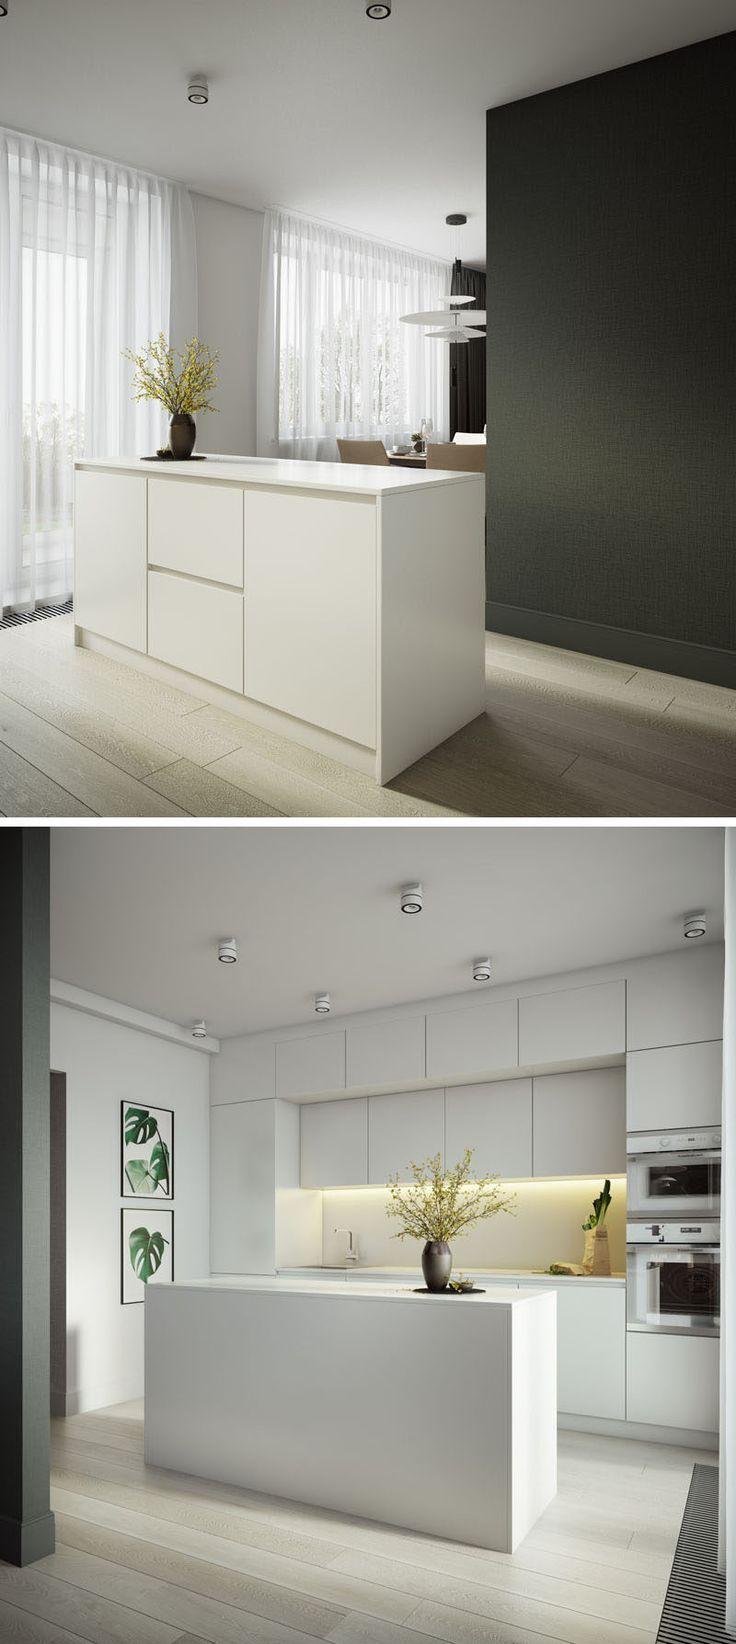 This modern apartment has a bright white kitchen with hardware-free cabinets. #ModernKitchen #WhiteKitchen